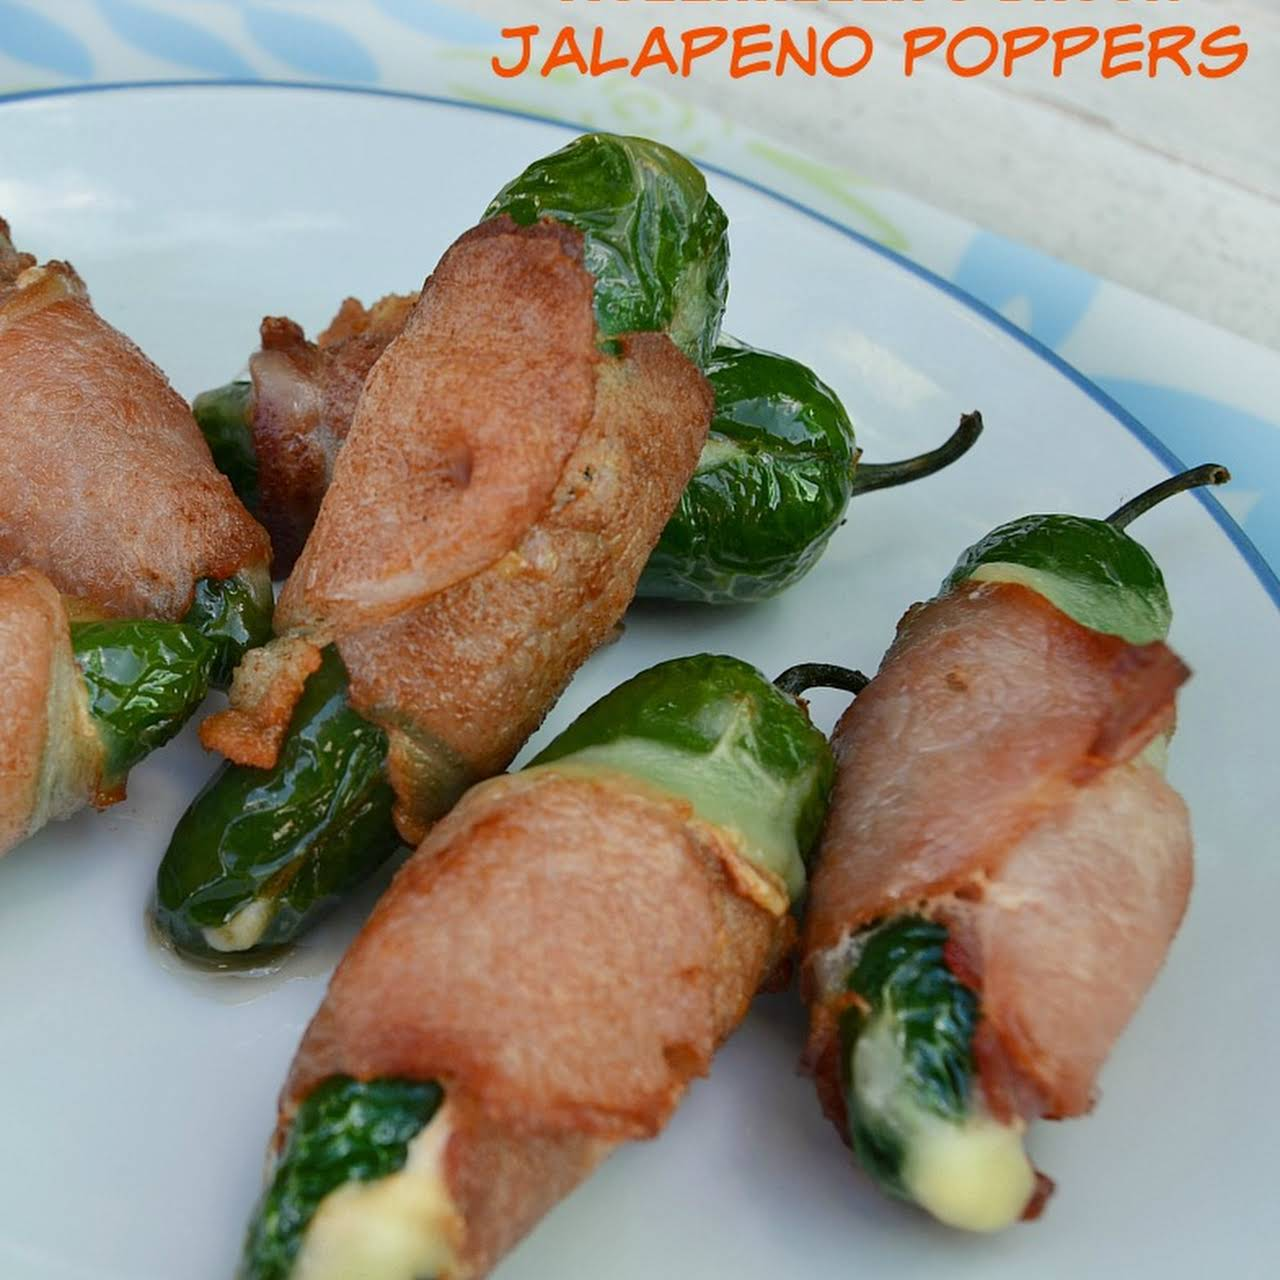 Mozzarella and Bacon Jalapeno Poppers